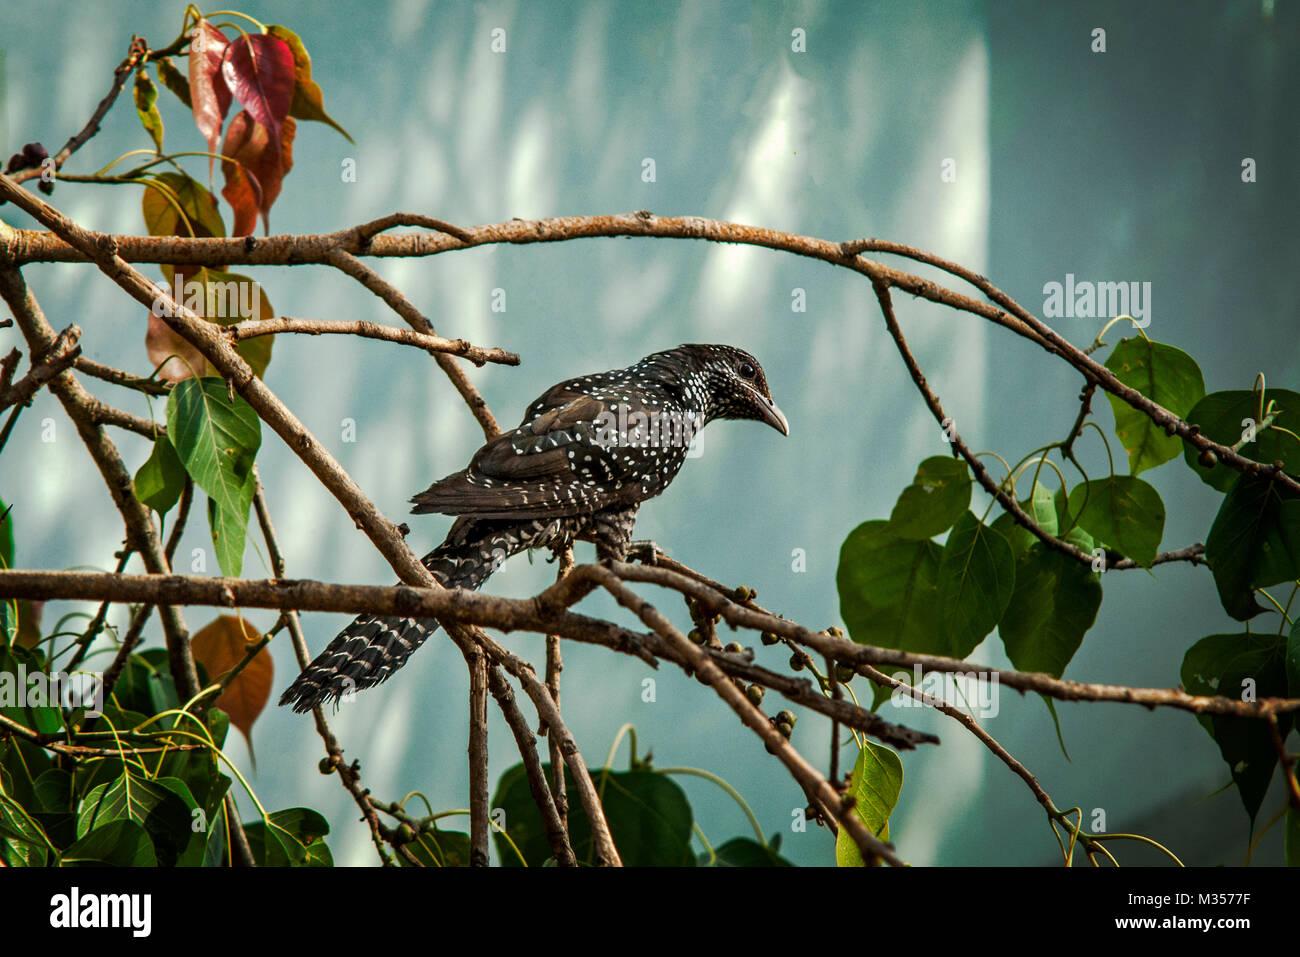 Cuckoo bird, India, Asia - Stock Image